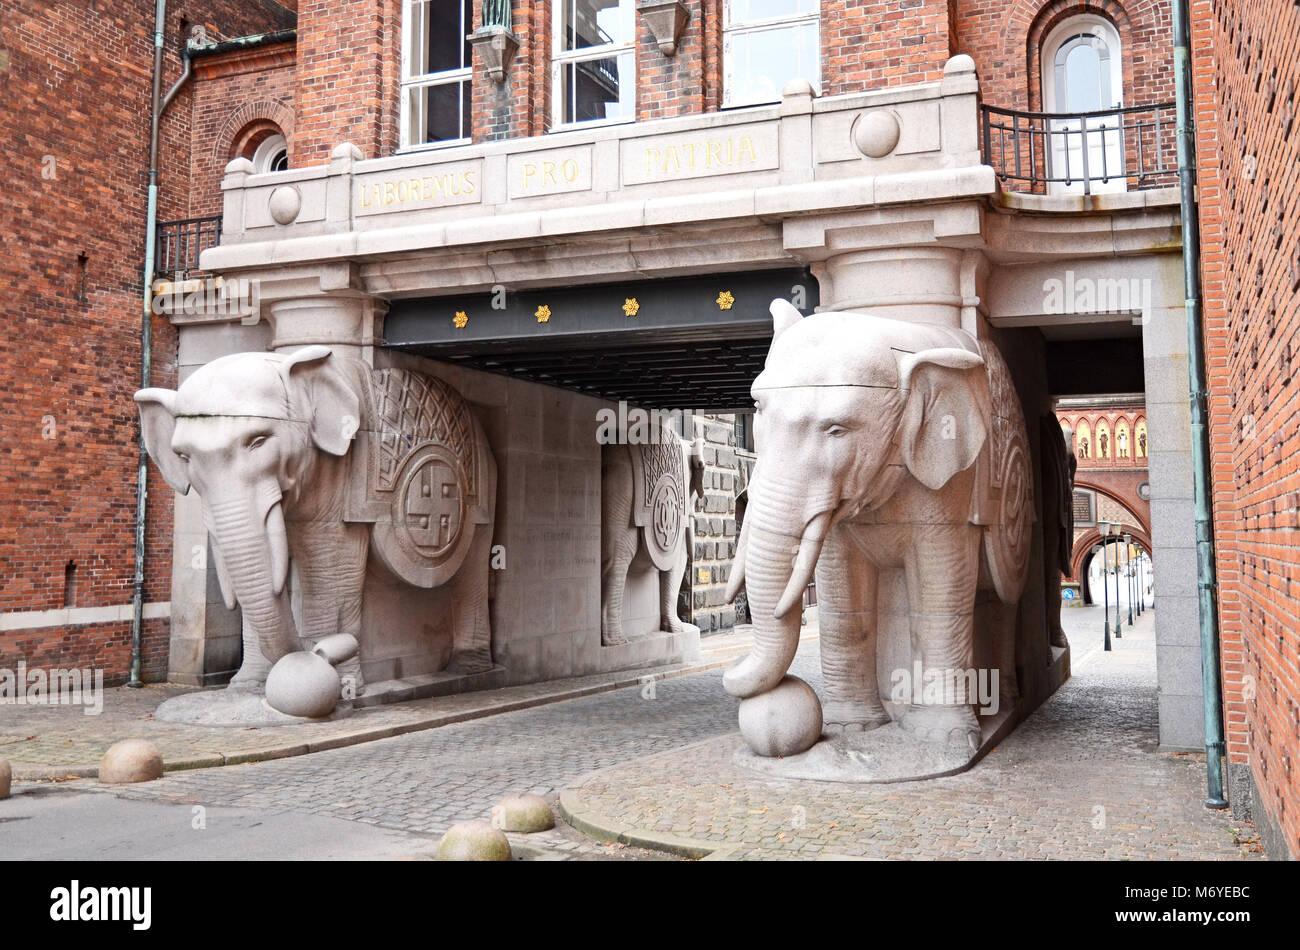 The Elephant gate at the Carlsberg brewery in Copenhagen, Denmark - Stock Image